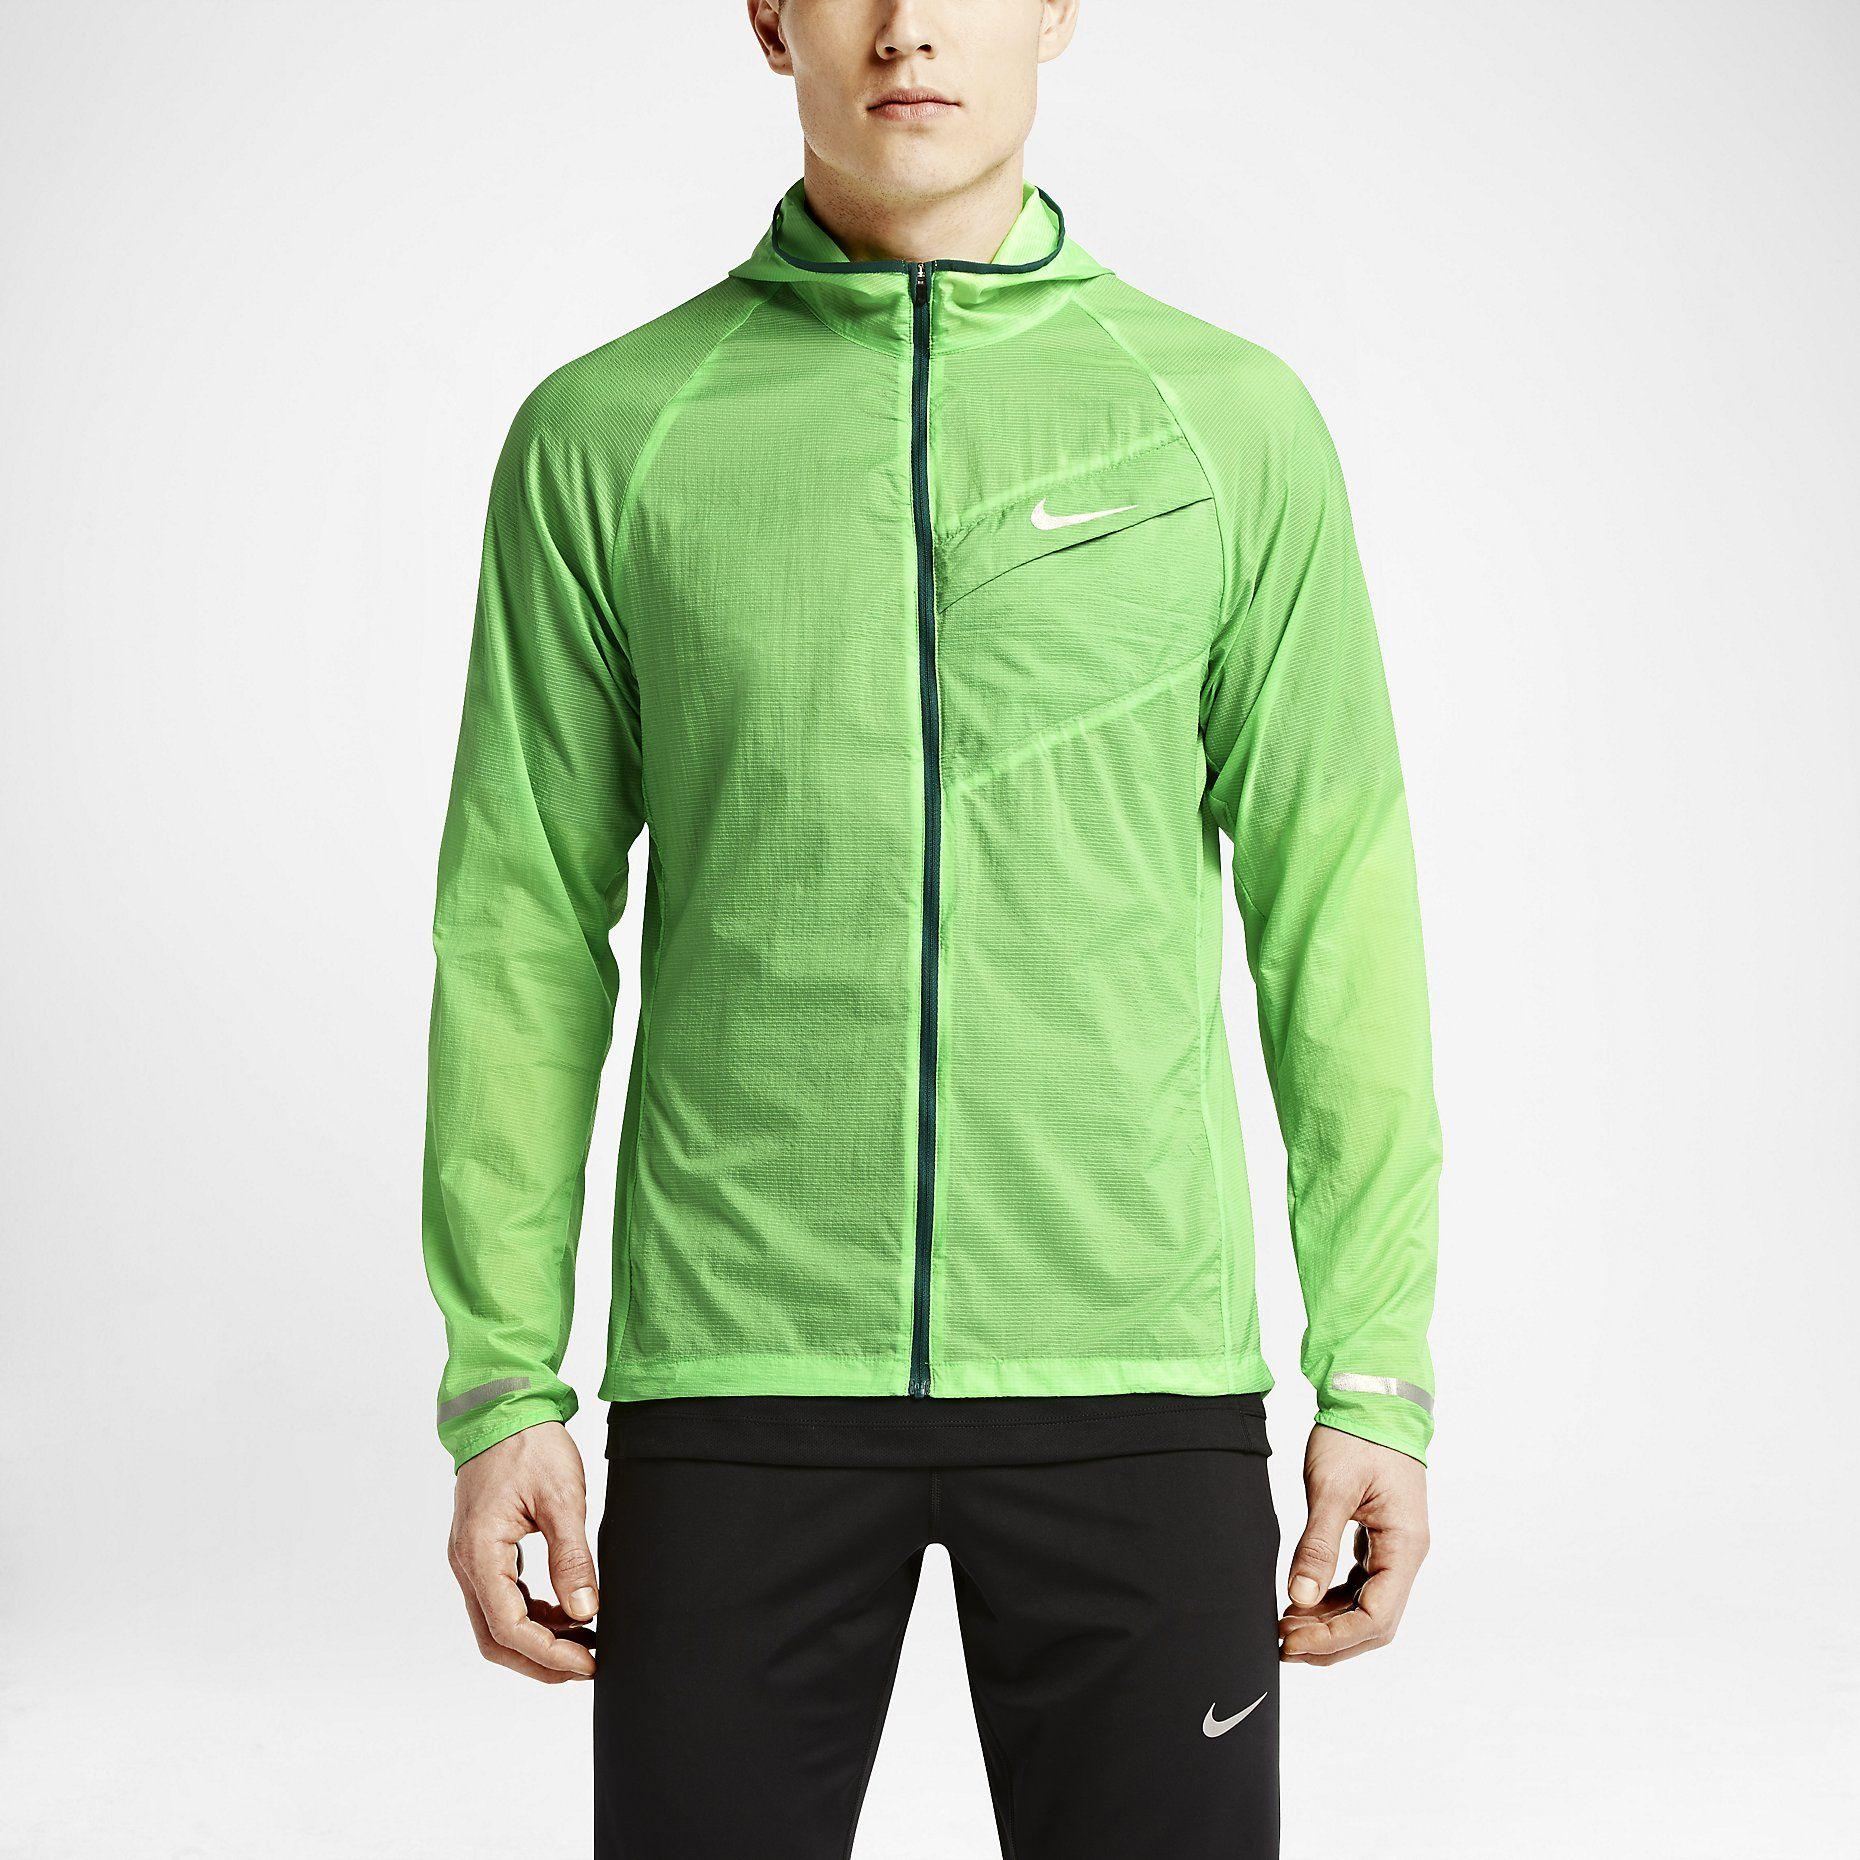 1fe06c86c2e4 Nike Impossibly Light Men s Running Jacket. Nike Store